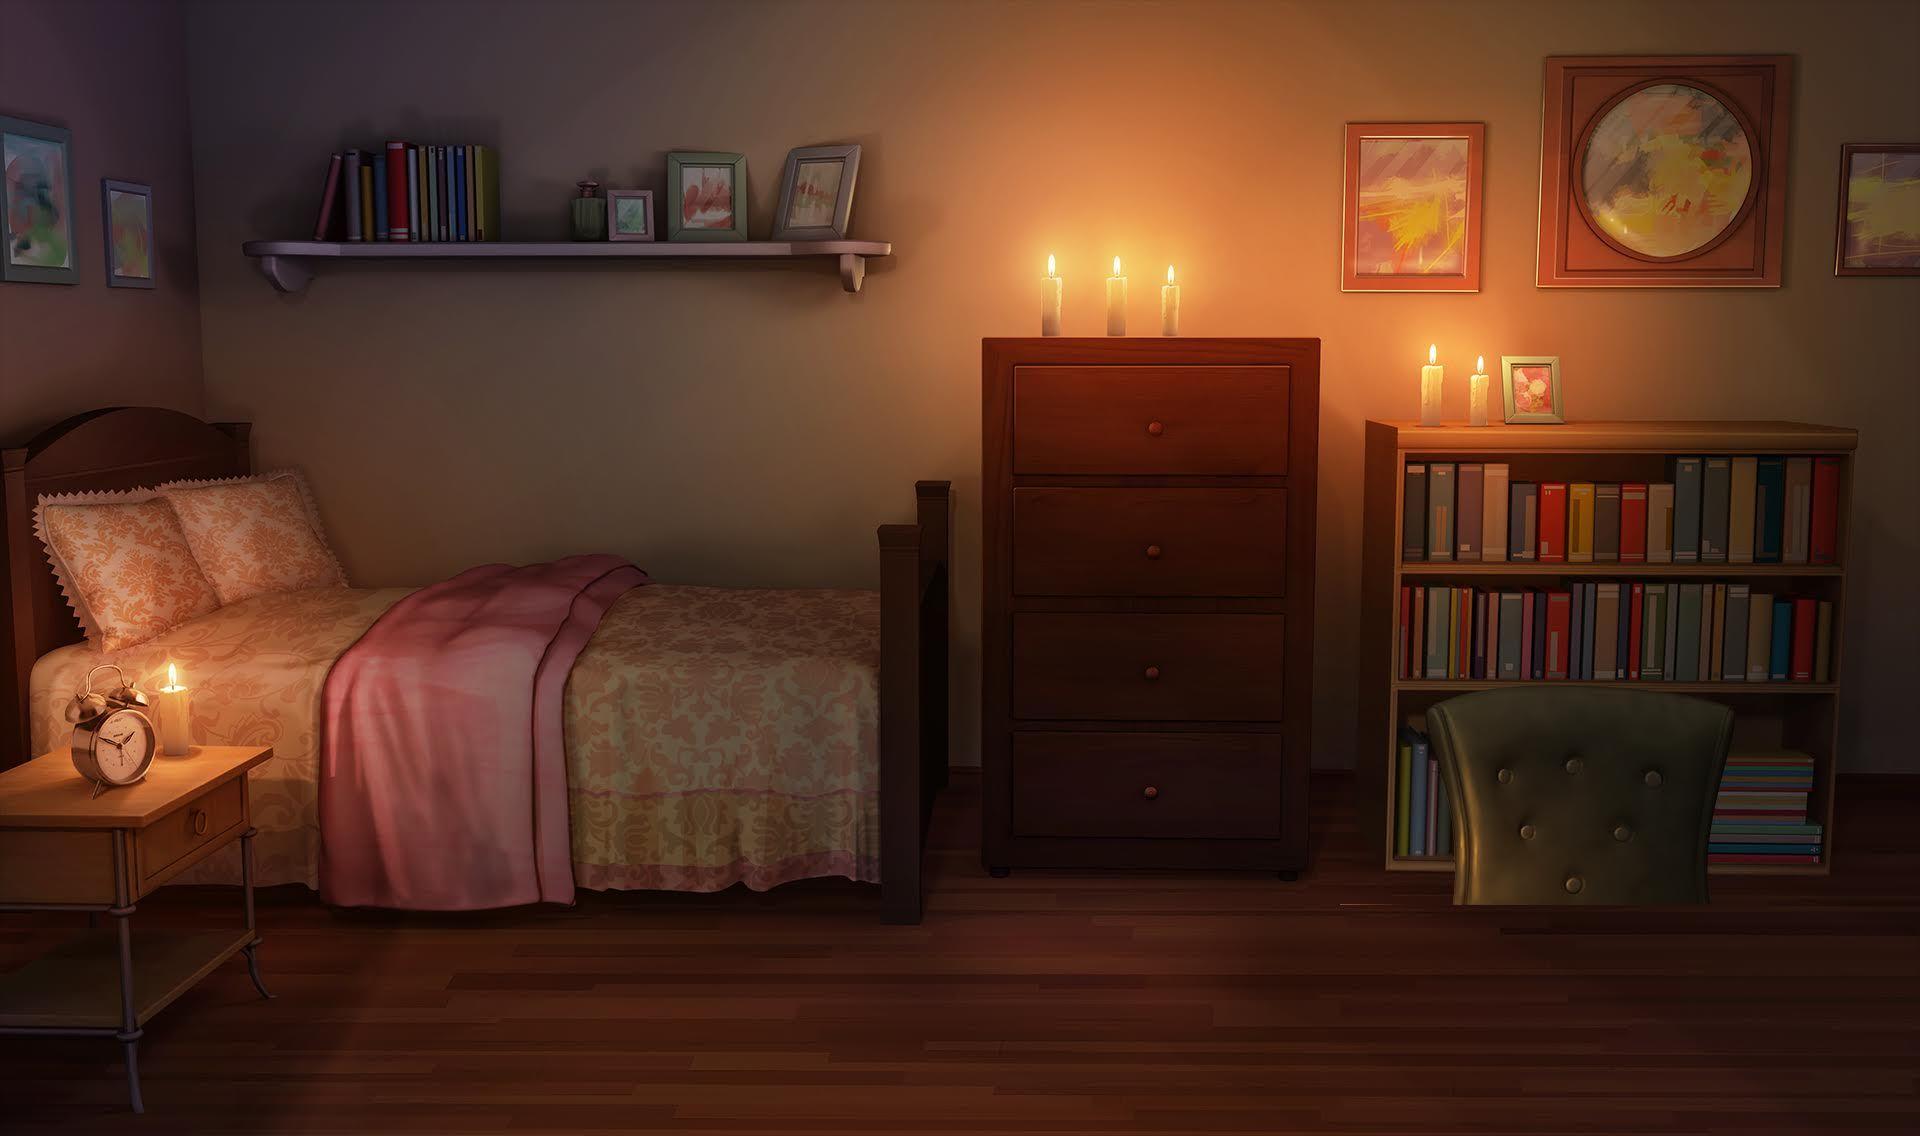 Living Room Cute Anime Bedroom Background Novocom Top